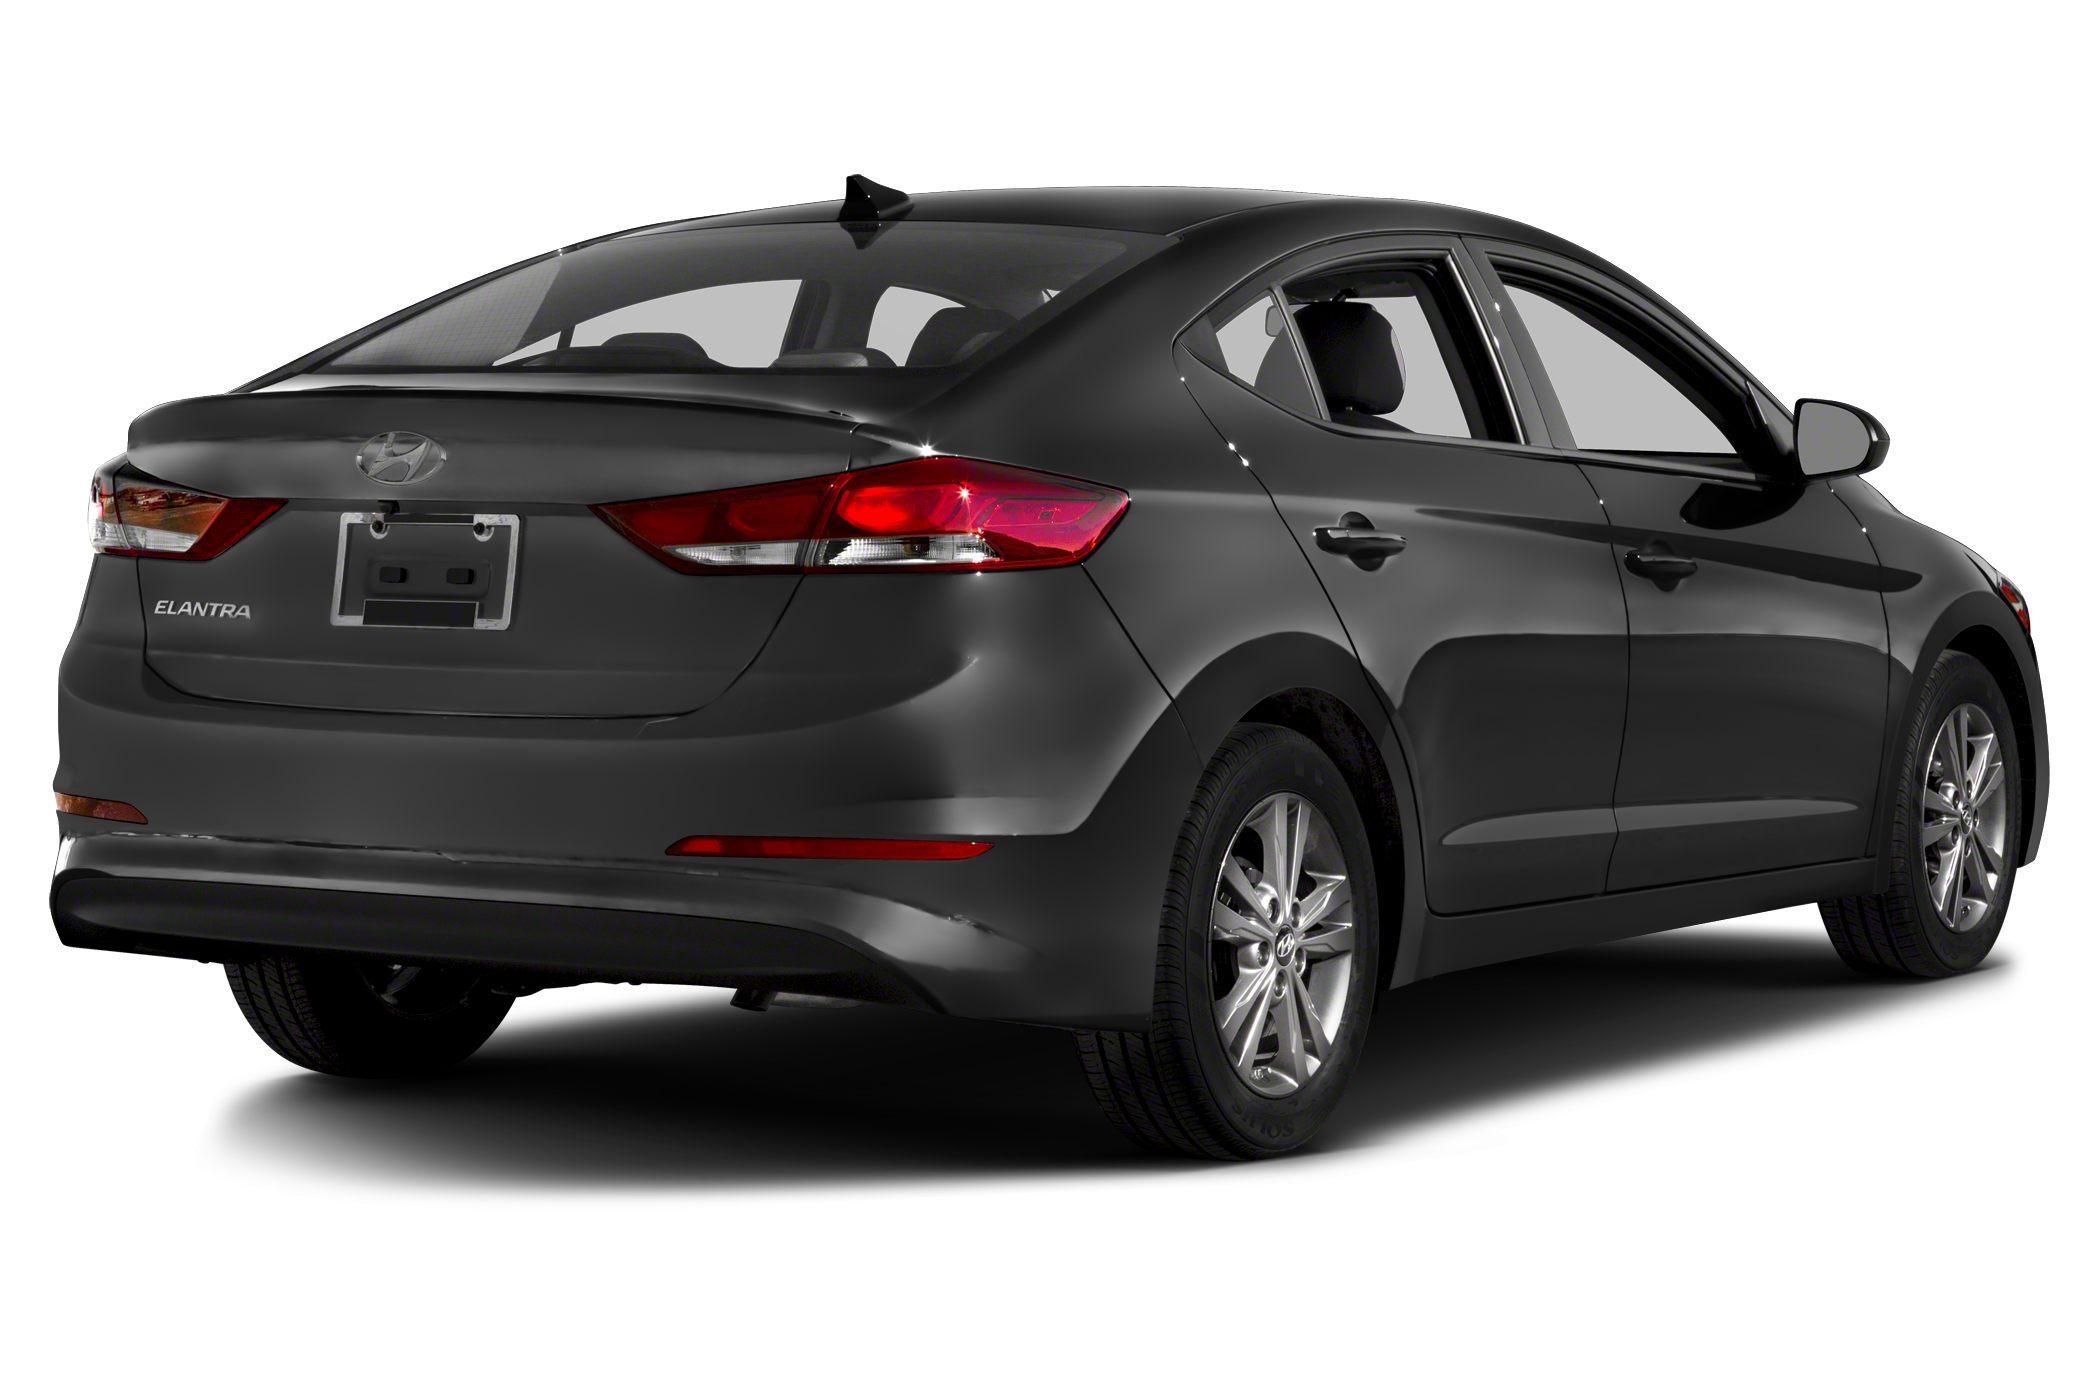 2017 Hyundai Elantra Styles Amp Features Highlights